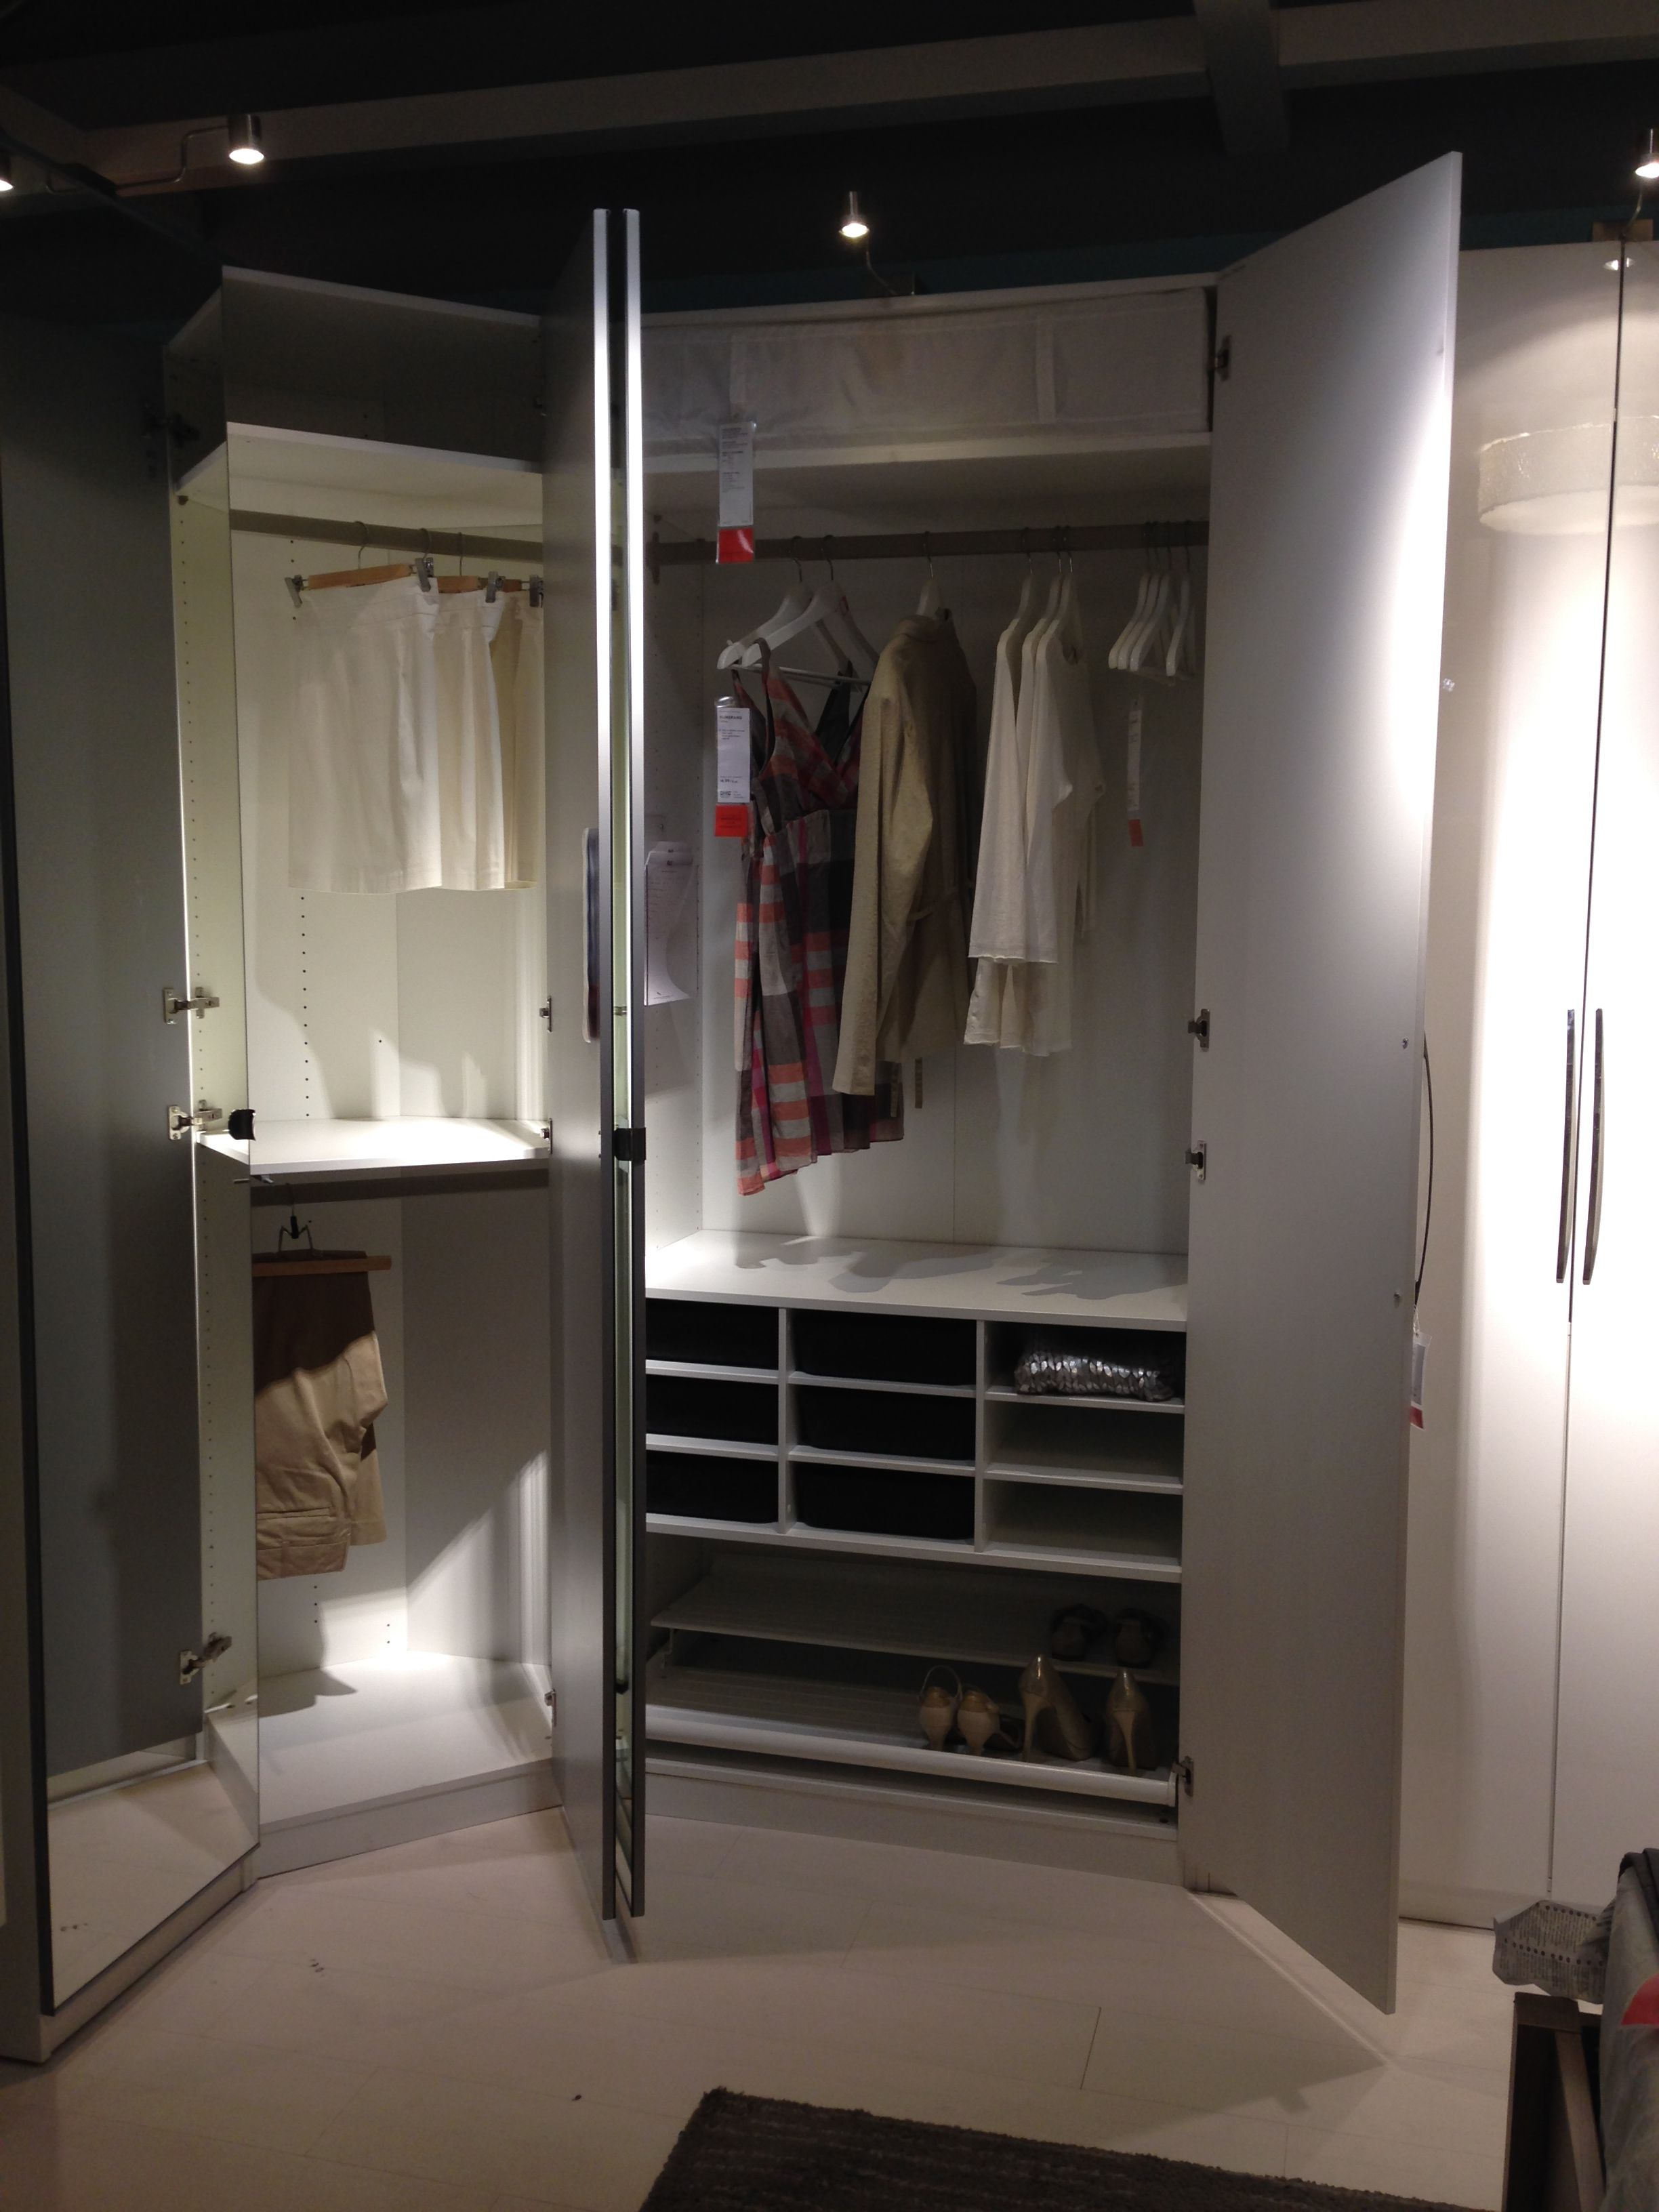 Pax wardrobe frame, Vikedal mirror door, Fardal door